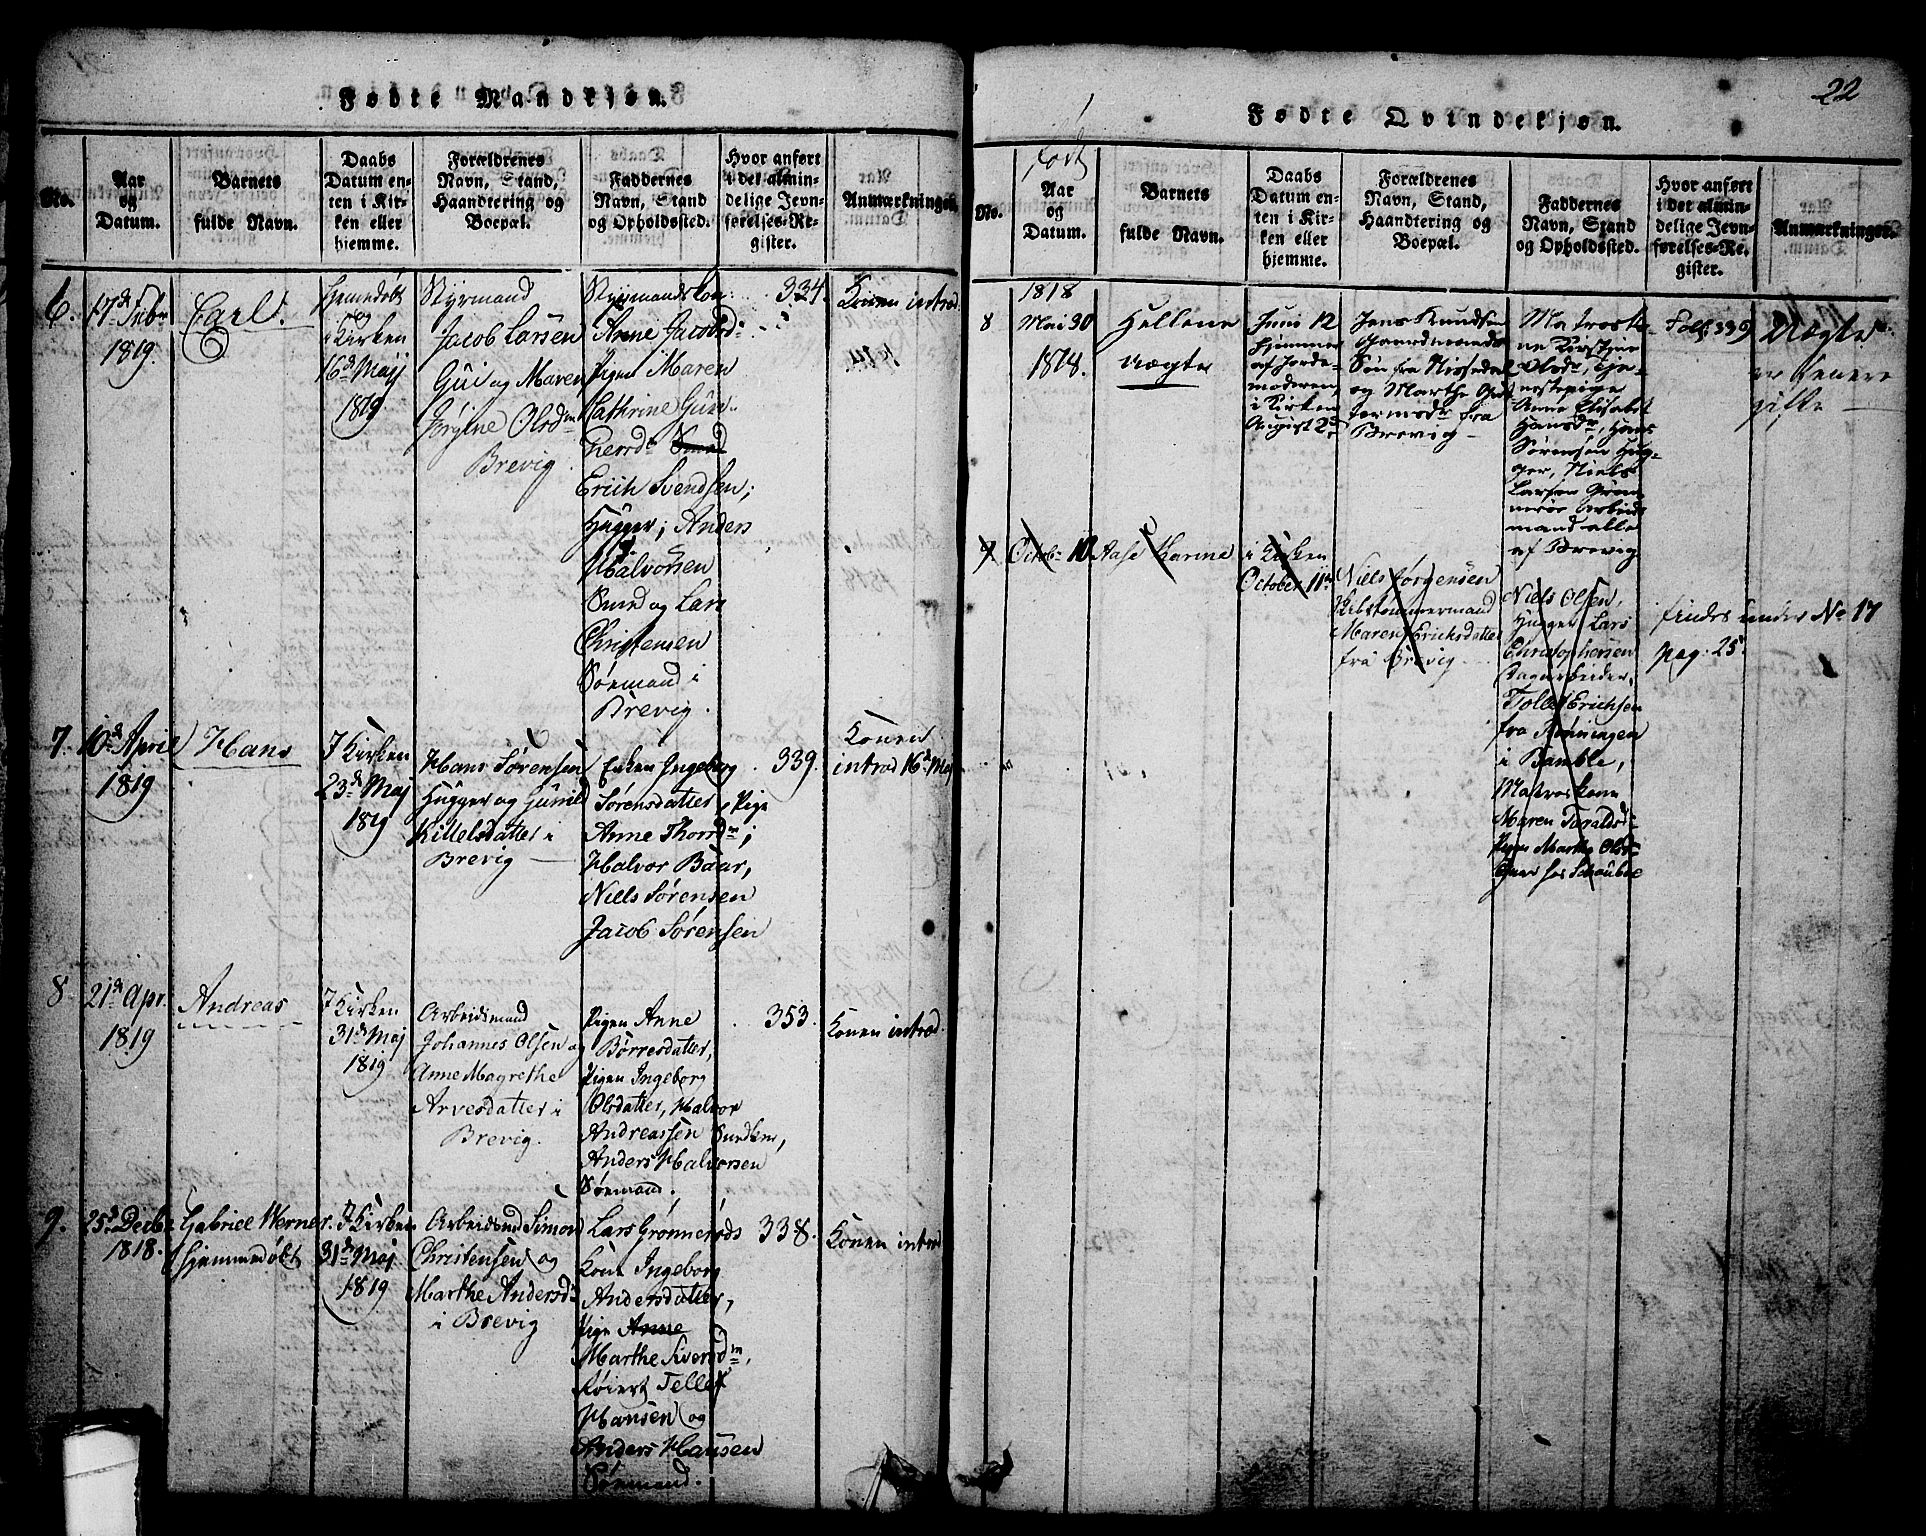 SAKO, Brevik kirkebøker, G/Ga/L0001: Klokkerbok nr. 1, 1814-1845, s. 22